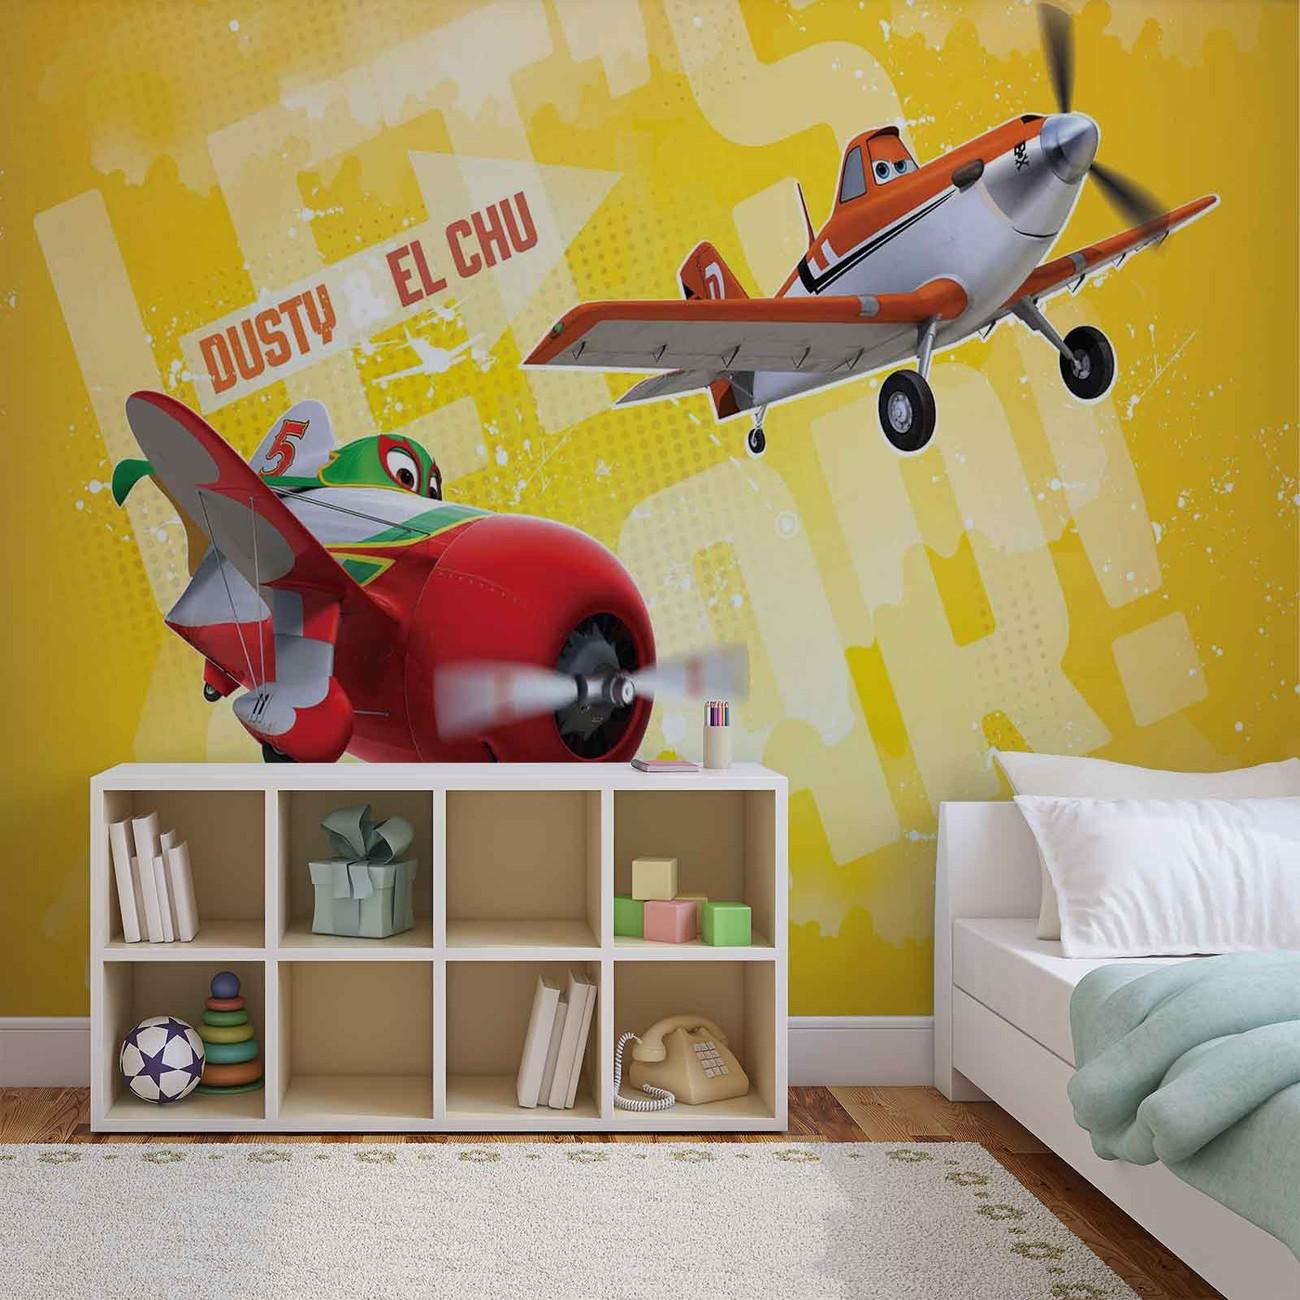 Disney Planes Wall Paper Mural   Buy at Abposters.com